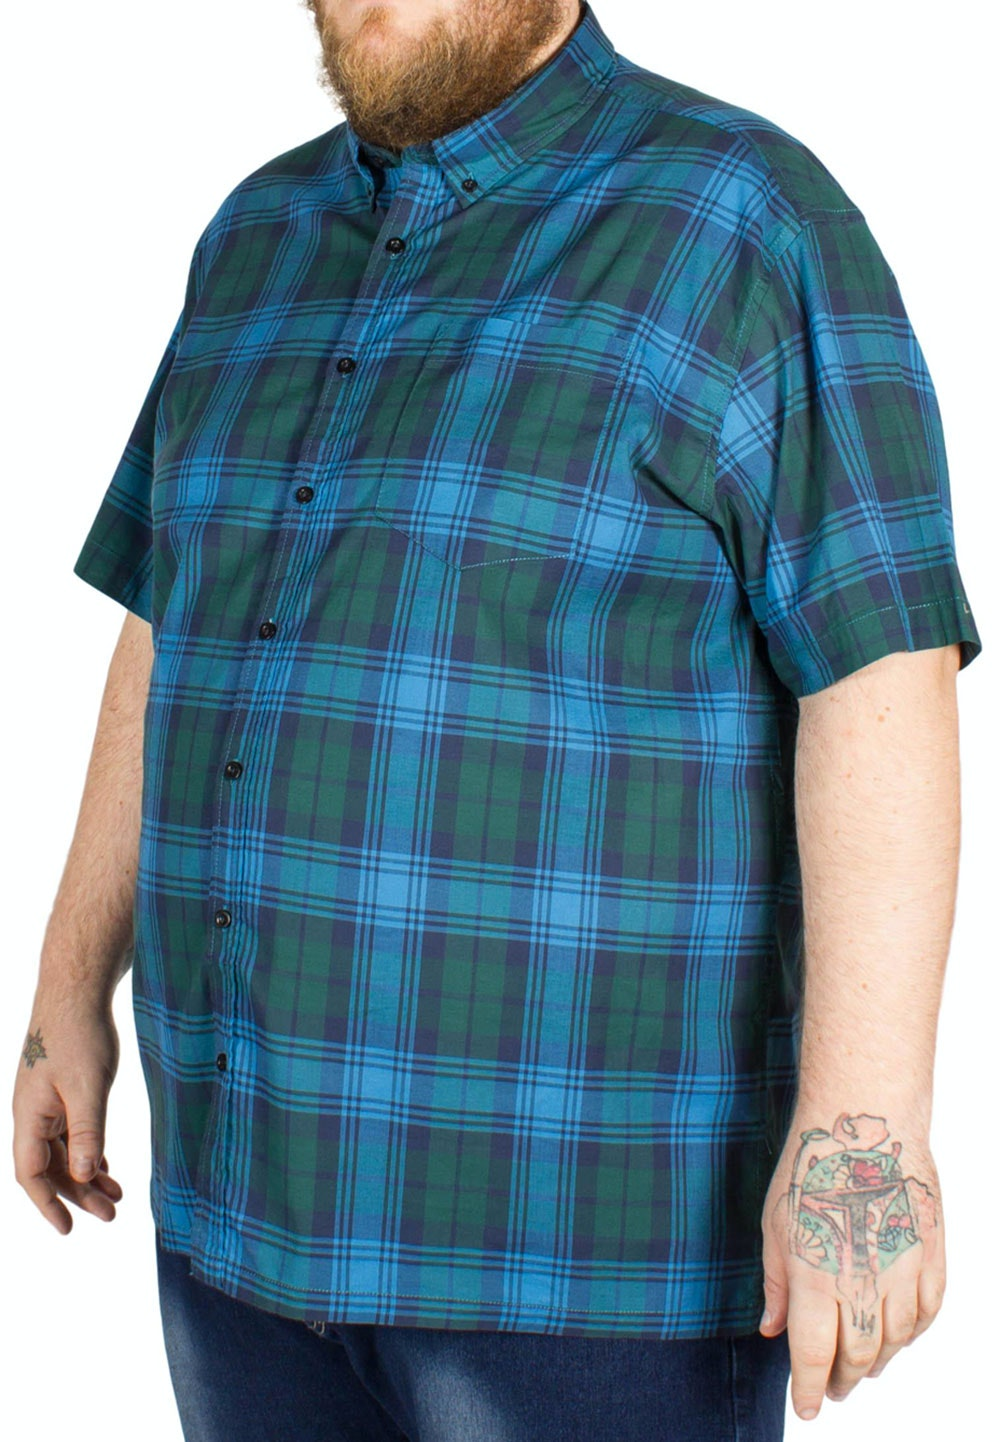 Bigdude Short Sleeve Check Shirt Navy/Green